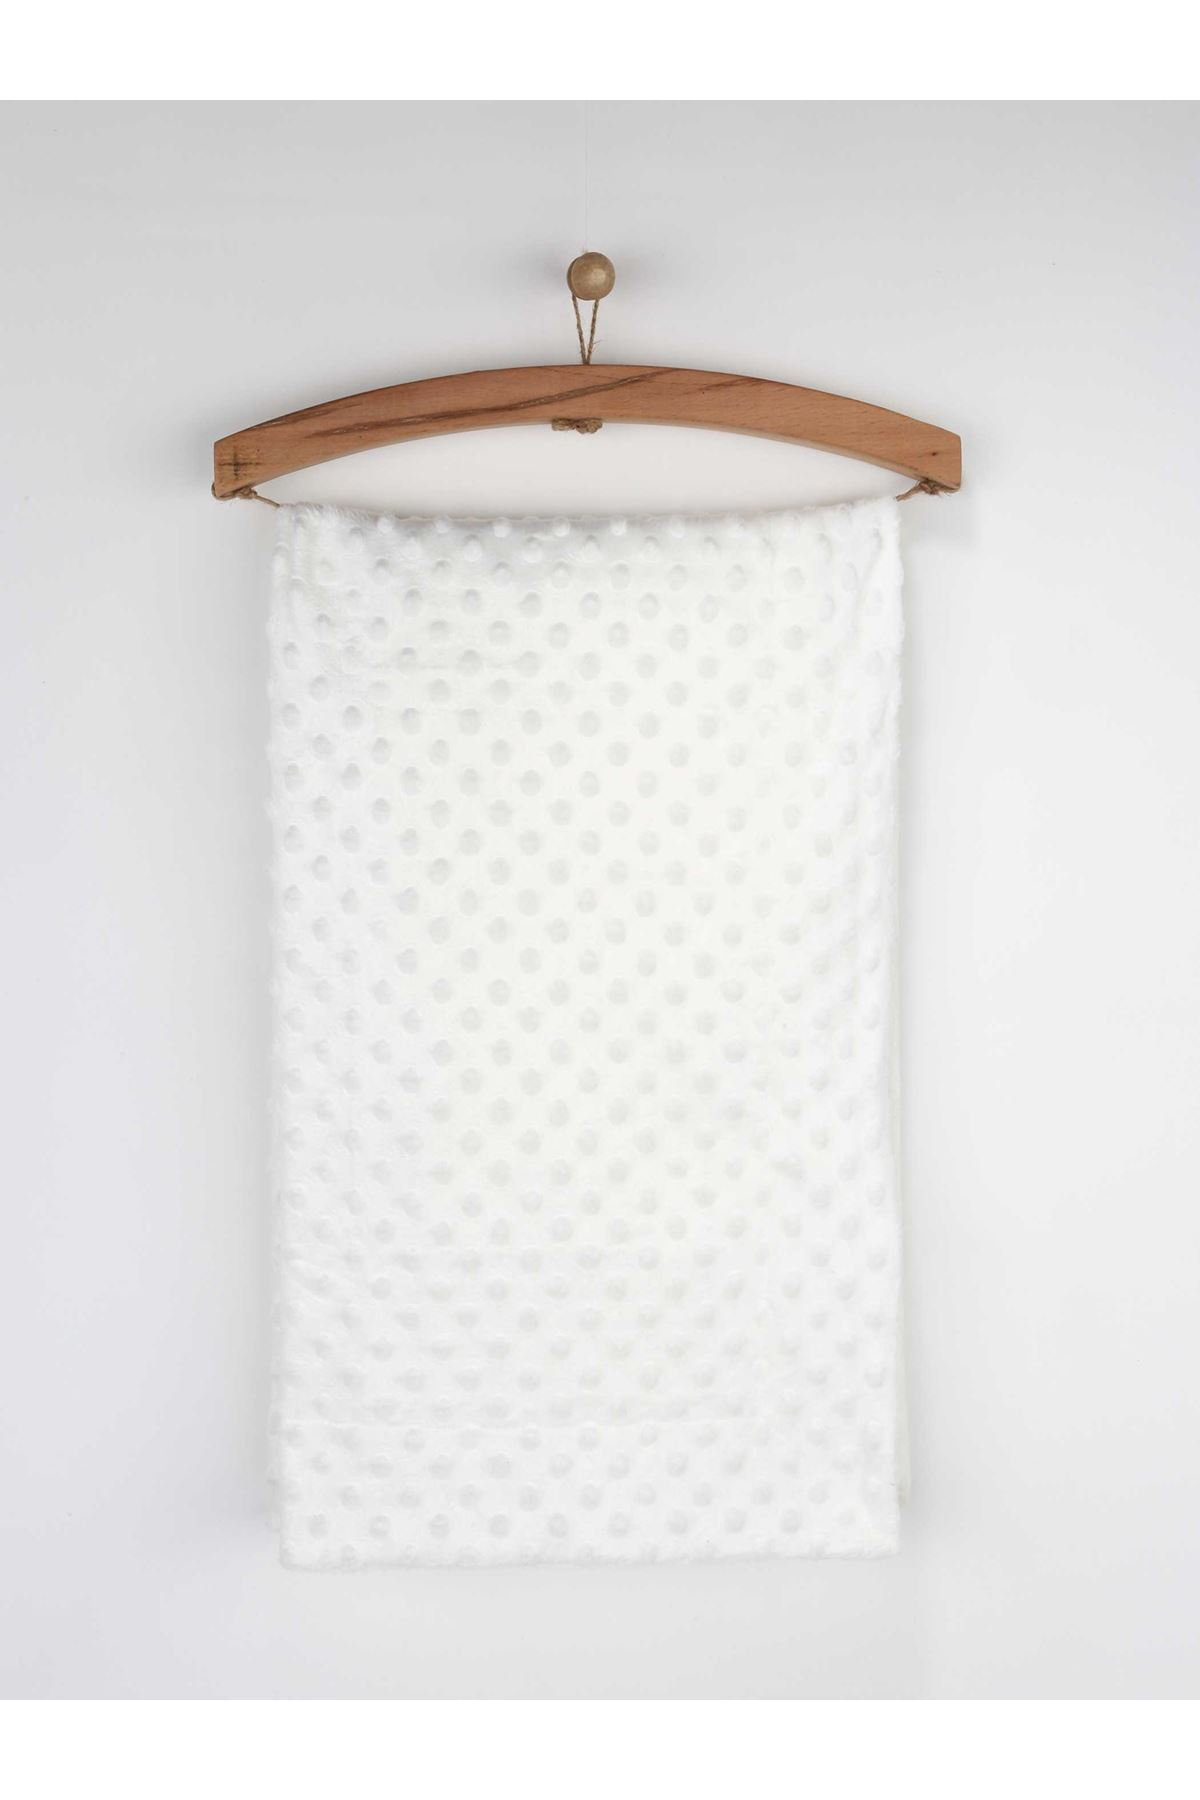 White 80x100 cm Chick Peas Pattern Baby Blanket